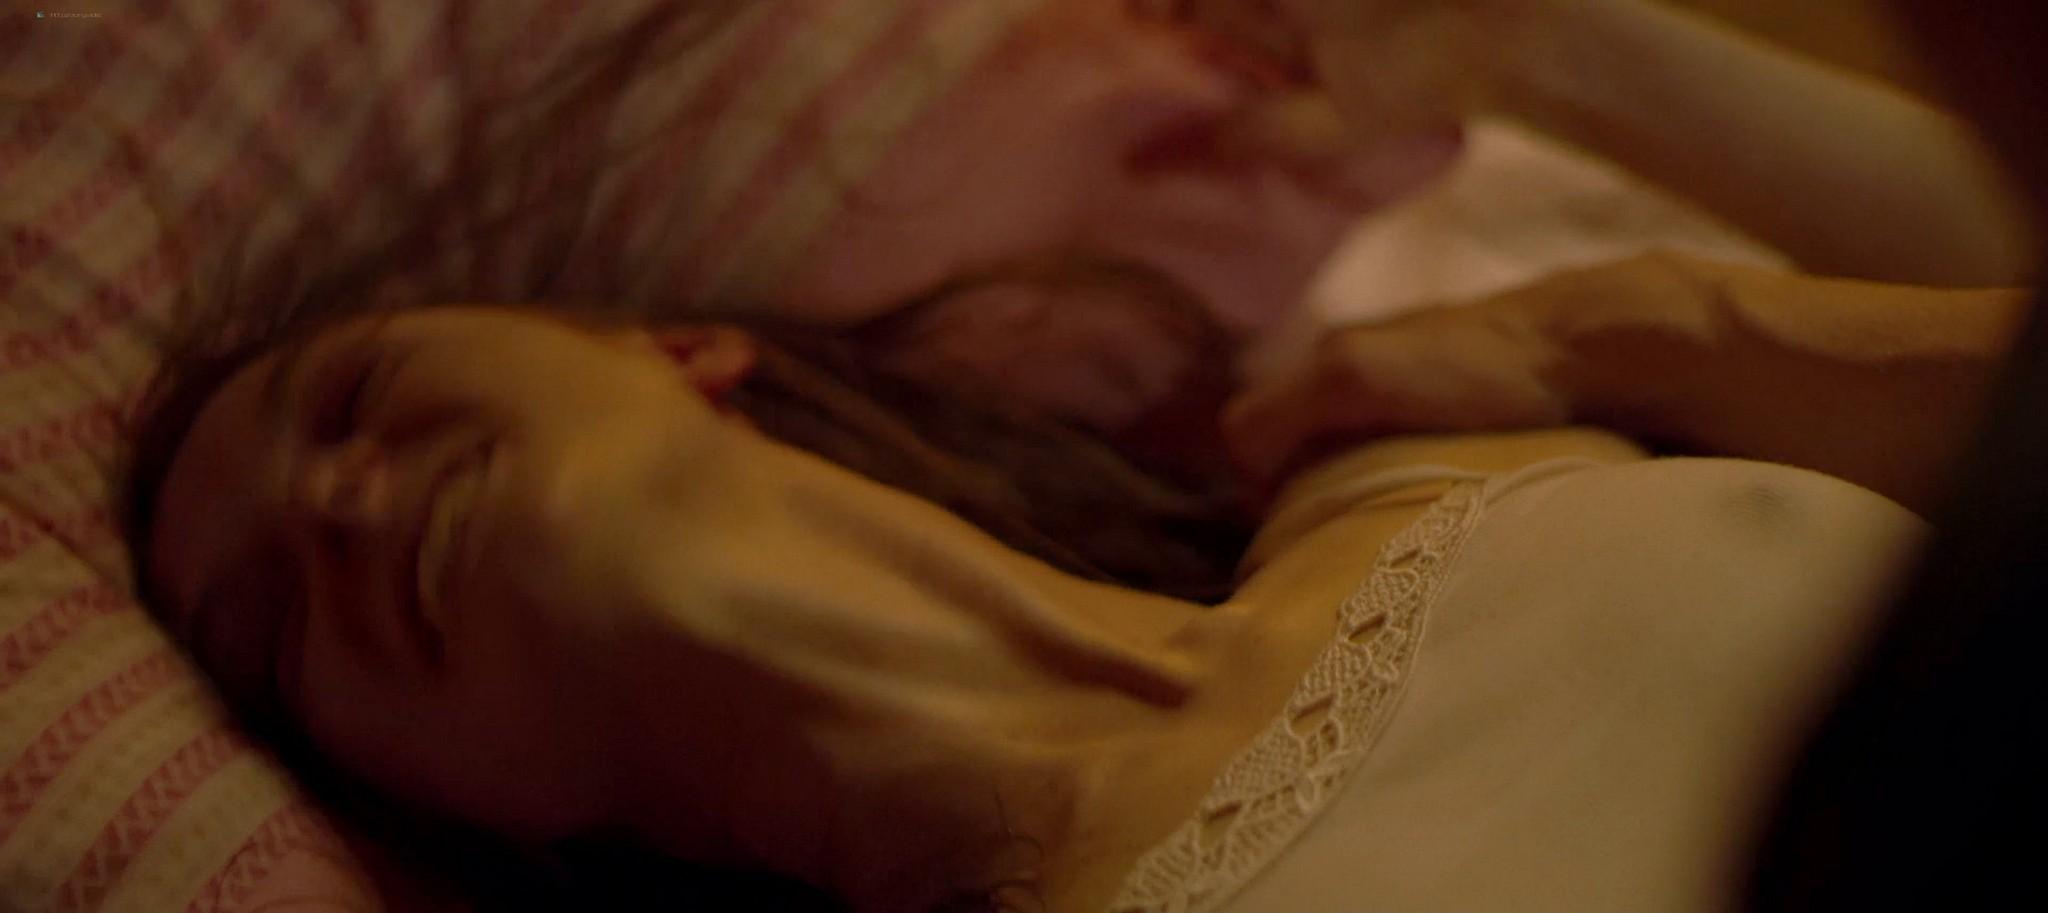 Sonya Cullingford nude sex Miriam Galanti sex In the Trap 2019 1080p Web 6